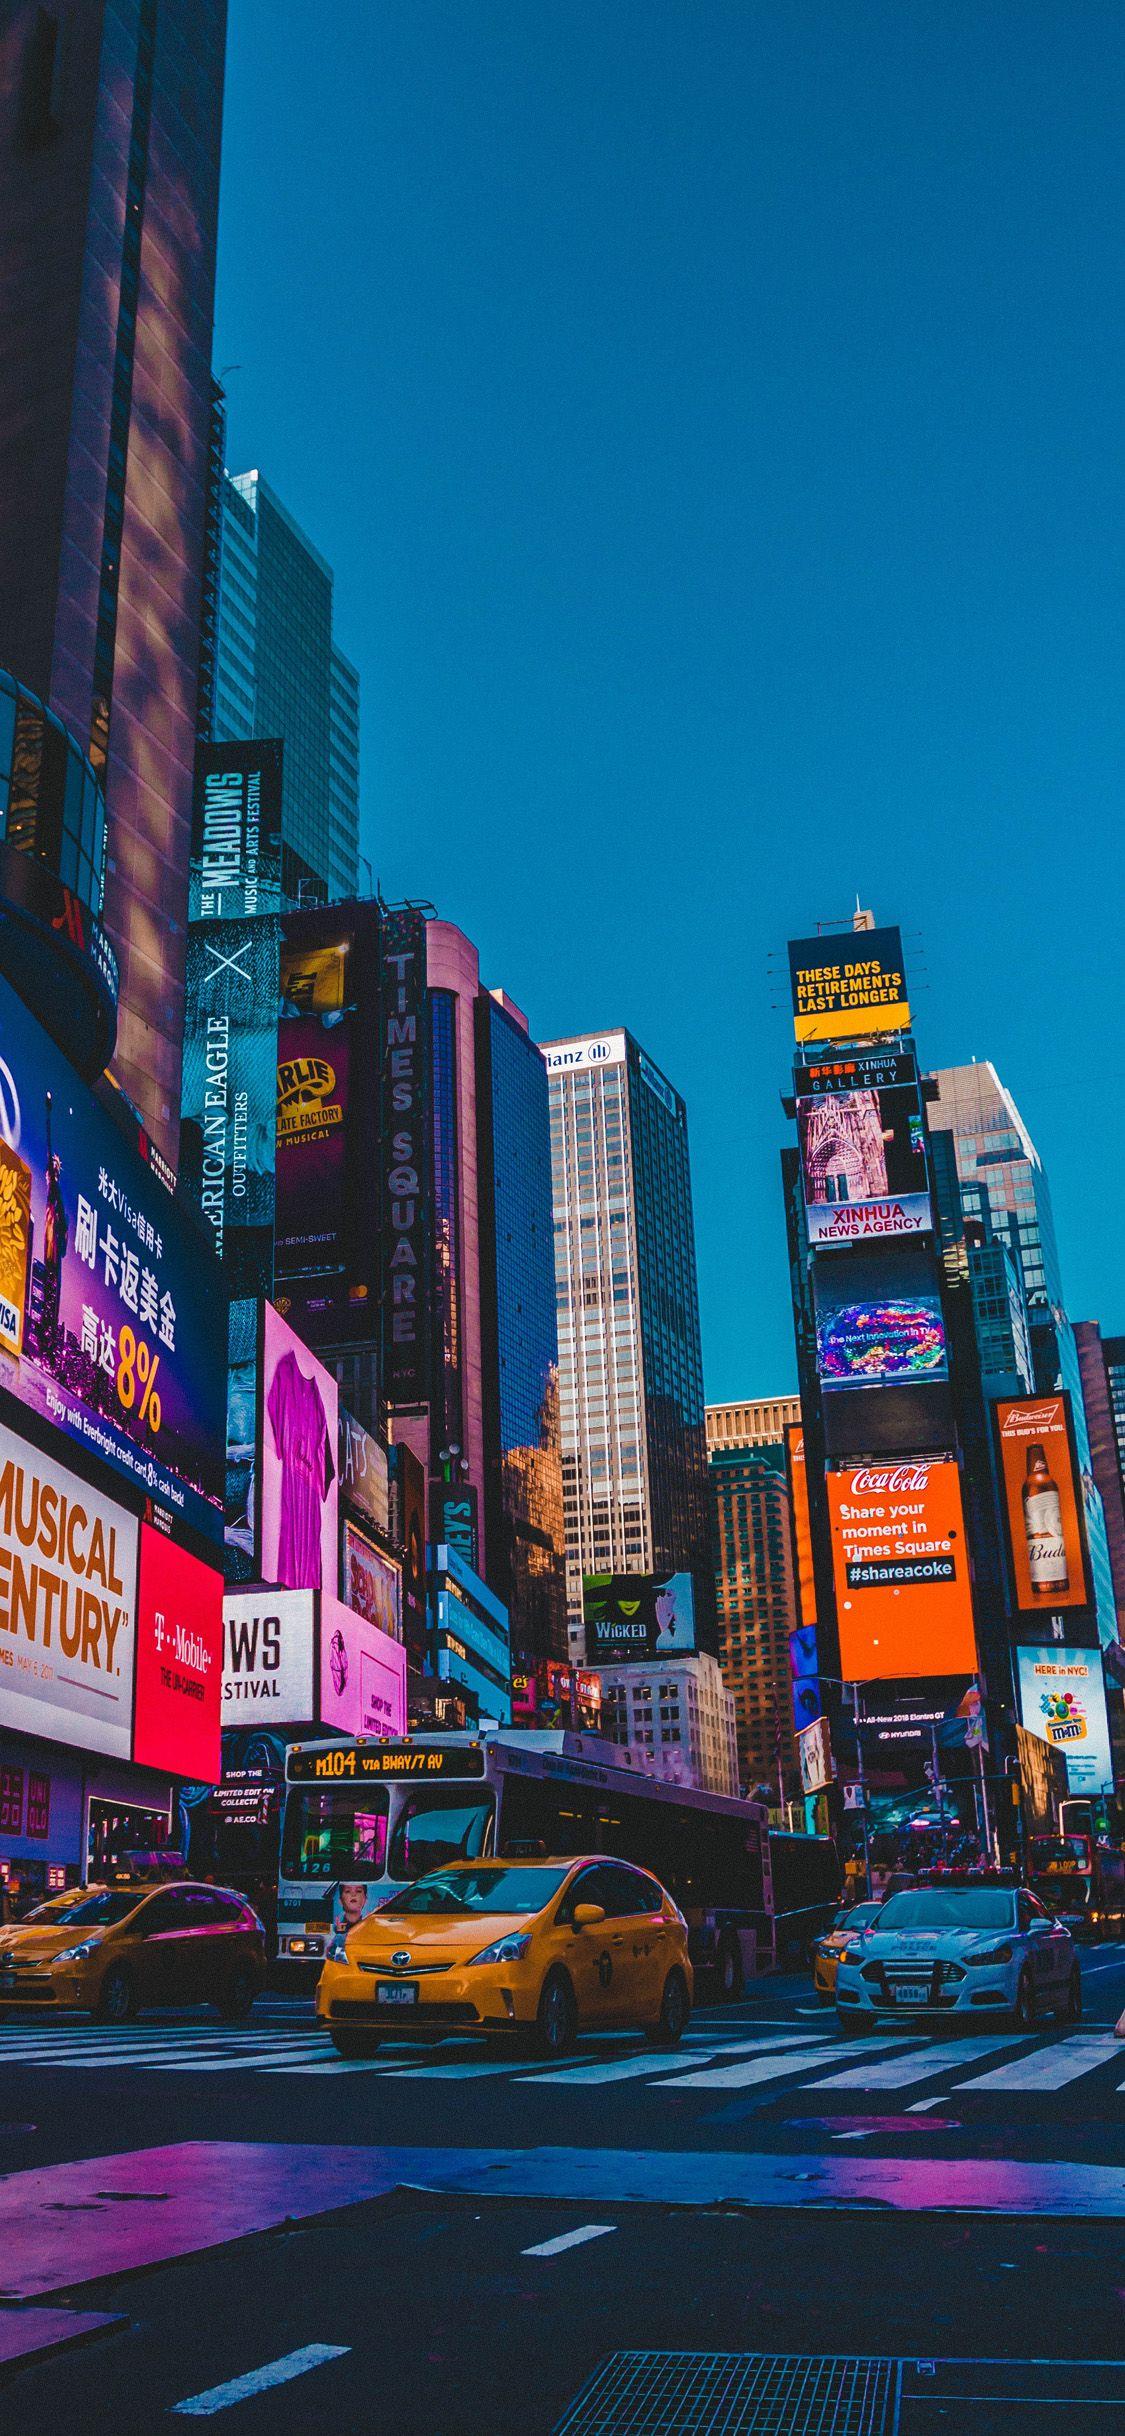 New York City City Wallpaper Stunning Wallpapers Xs Max Wallpaper